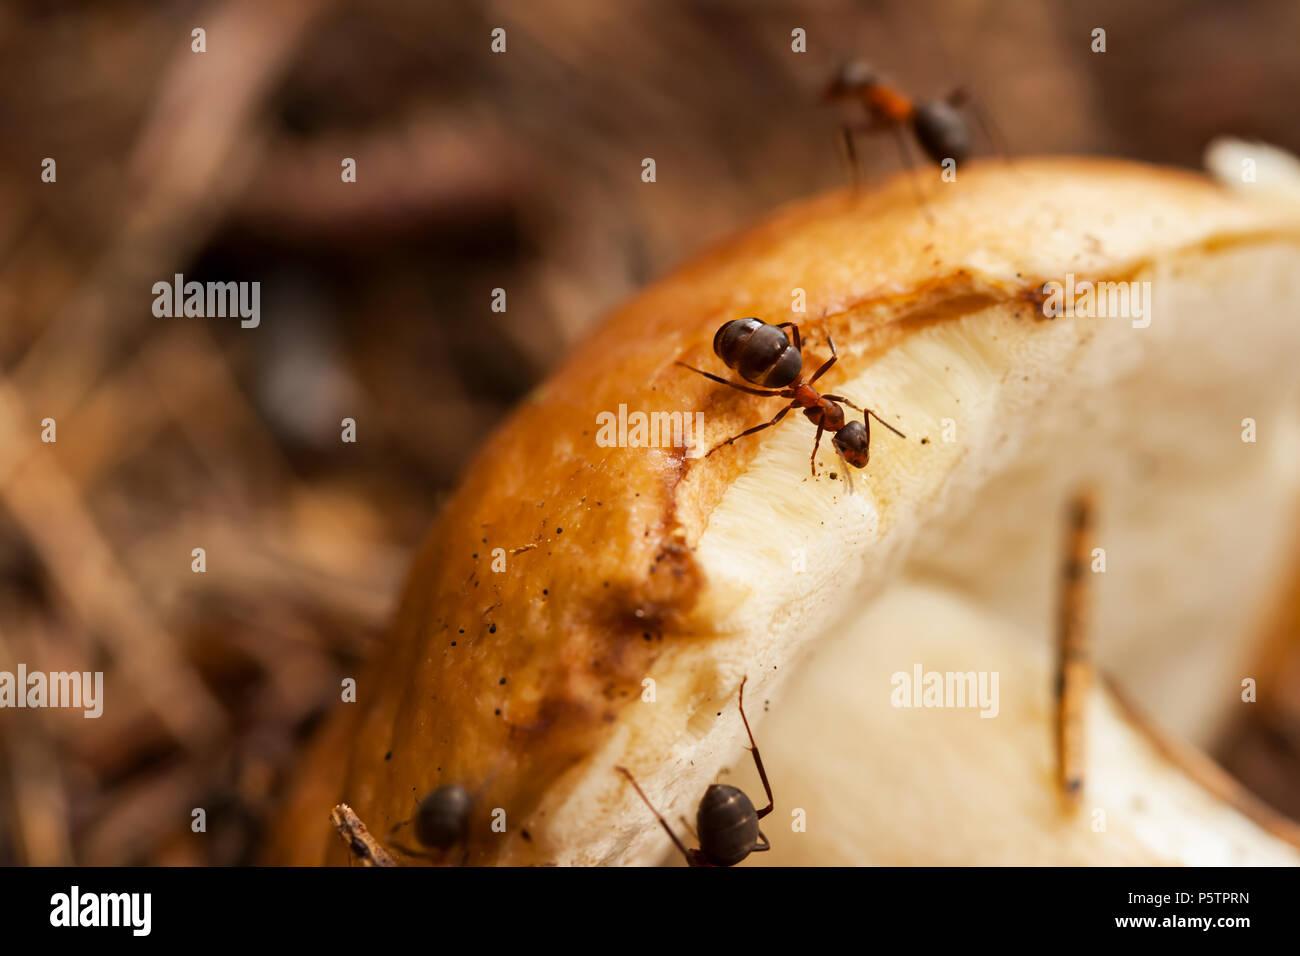 Little ants and big mushroom - Stock Image